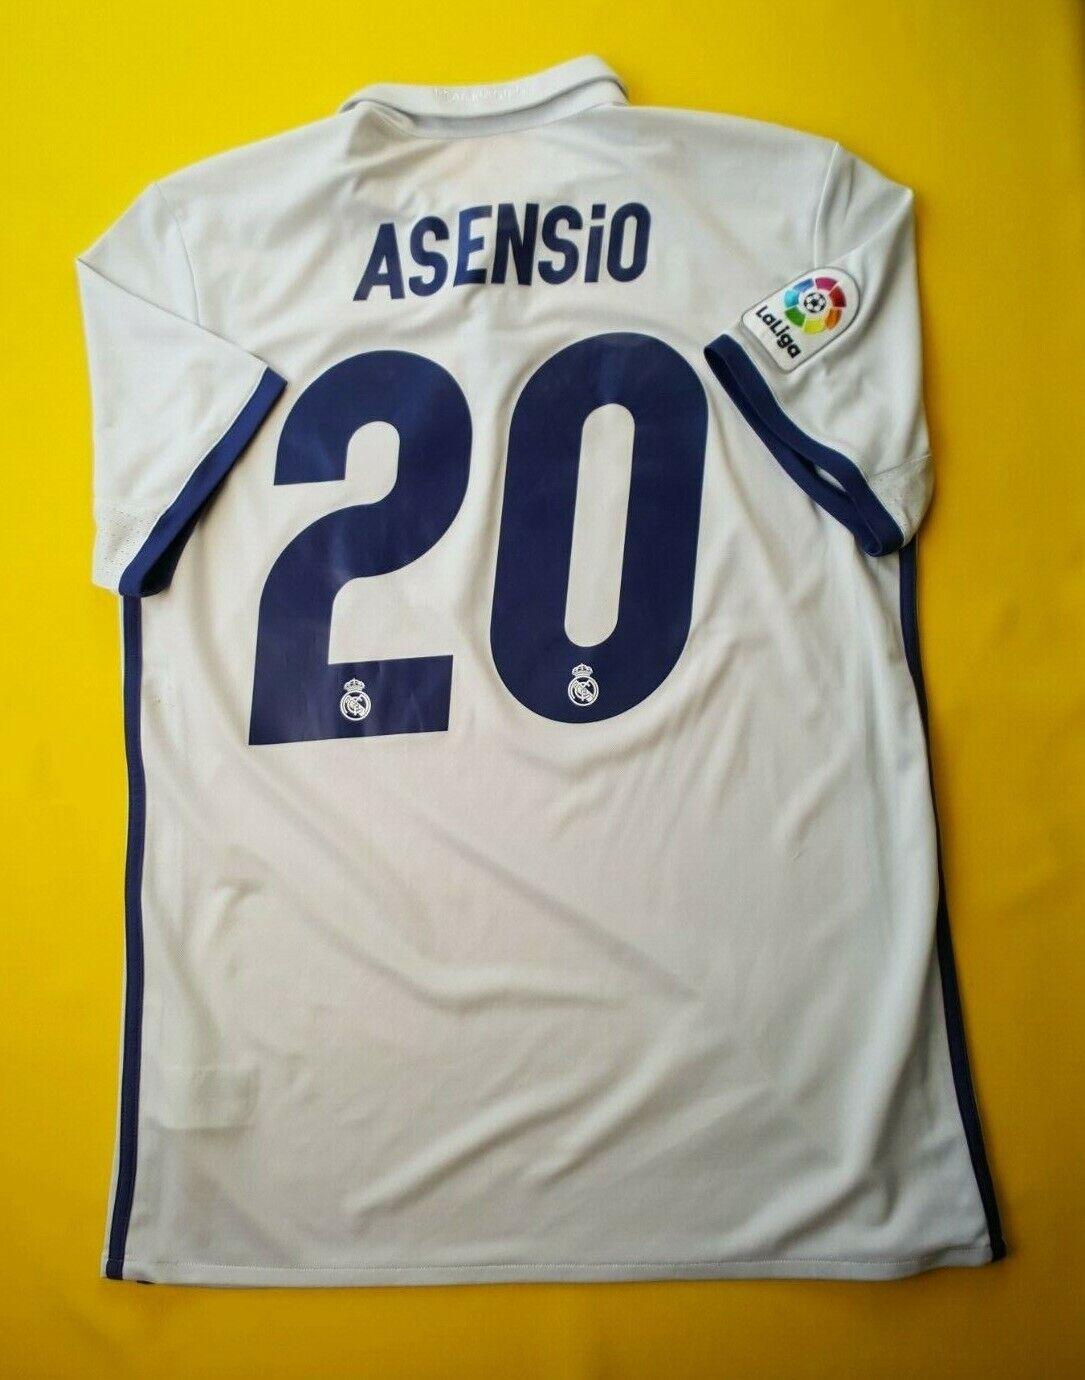 5+ 5 Asensio Real Madrid jersey medium 2017 shirt S94992soccer Adidas ig93